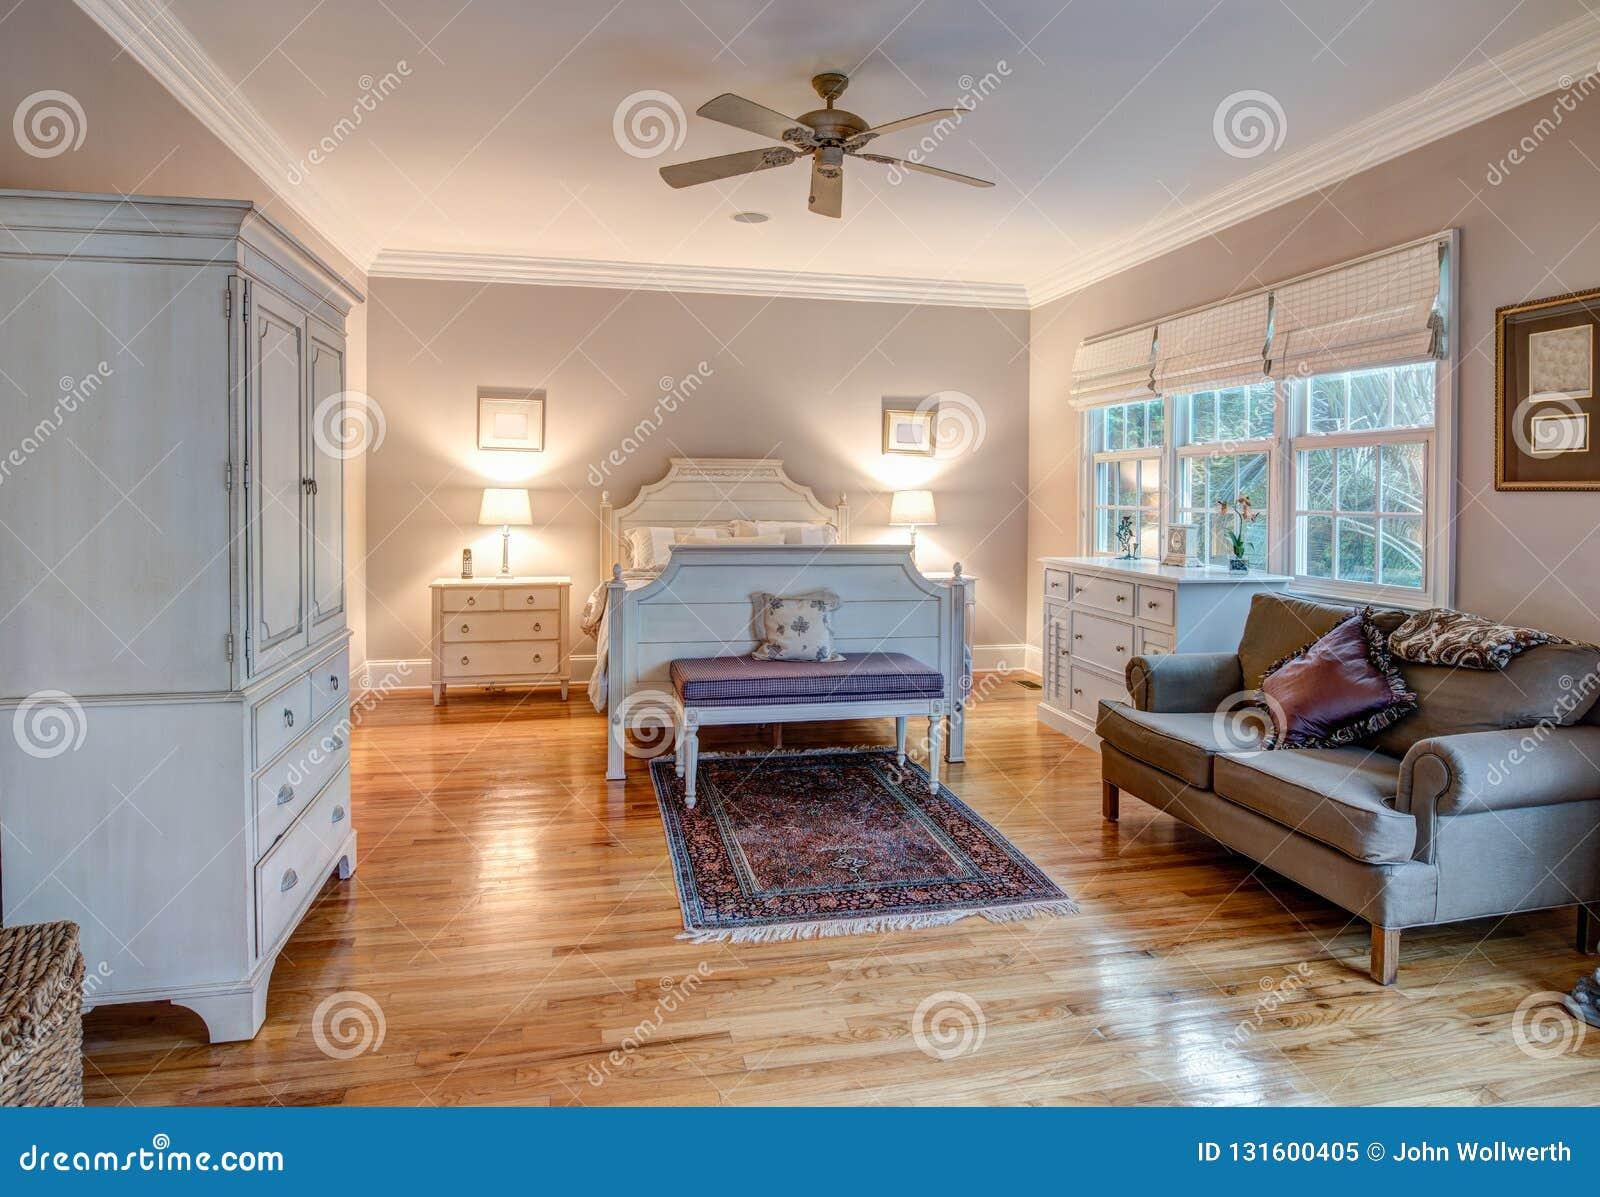 Elegant Bedroom With Wood Floors And Tasteful Furniture Stock Image - Image Of Dresser, Hard: 131600405